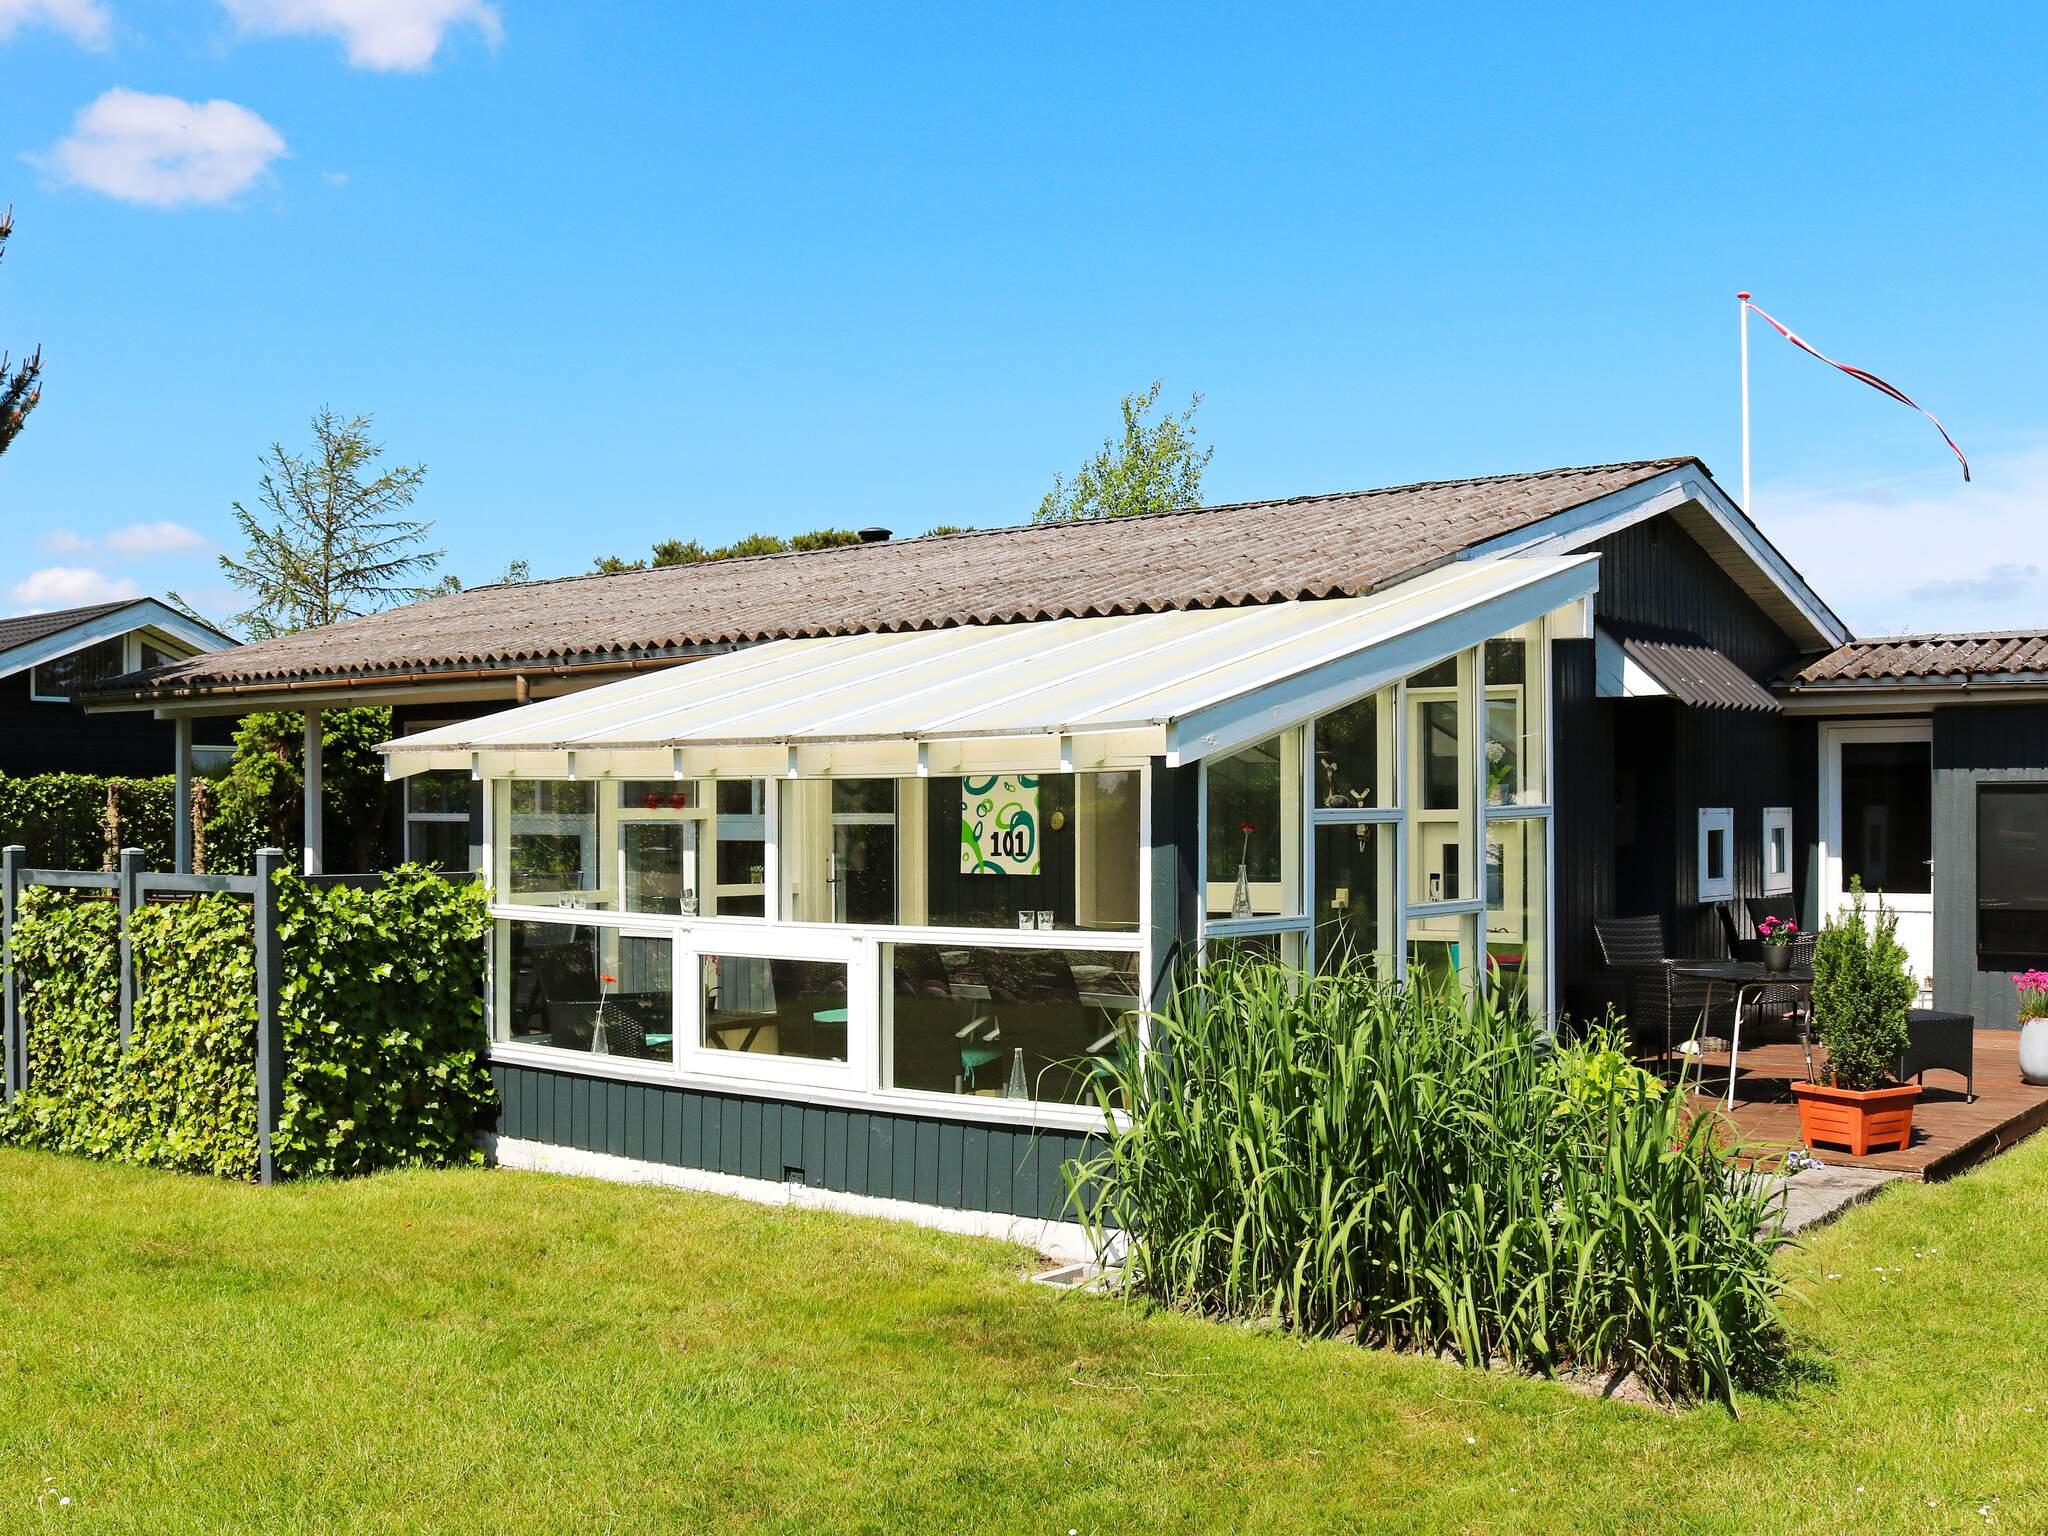 Ferienhaus Øster Hurup (356533), Øster Hurup, , Ostjütland, Dänemark, Bild 13